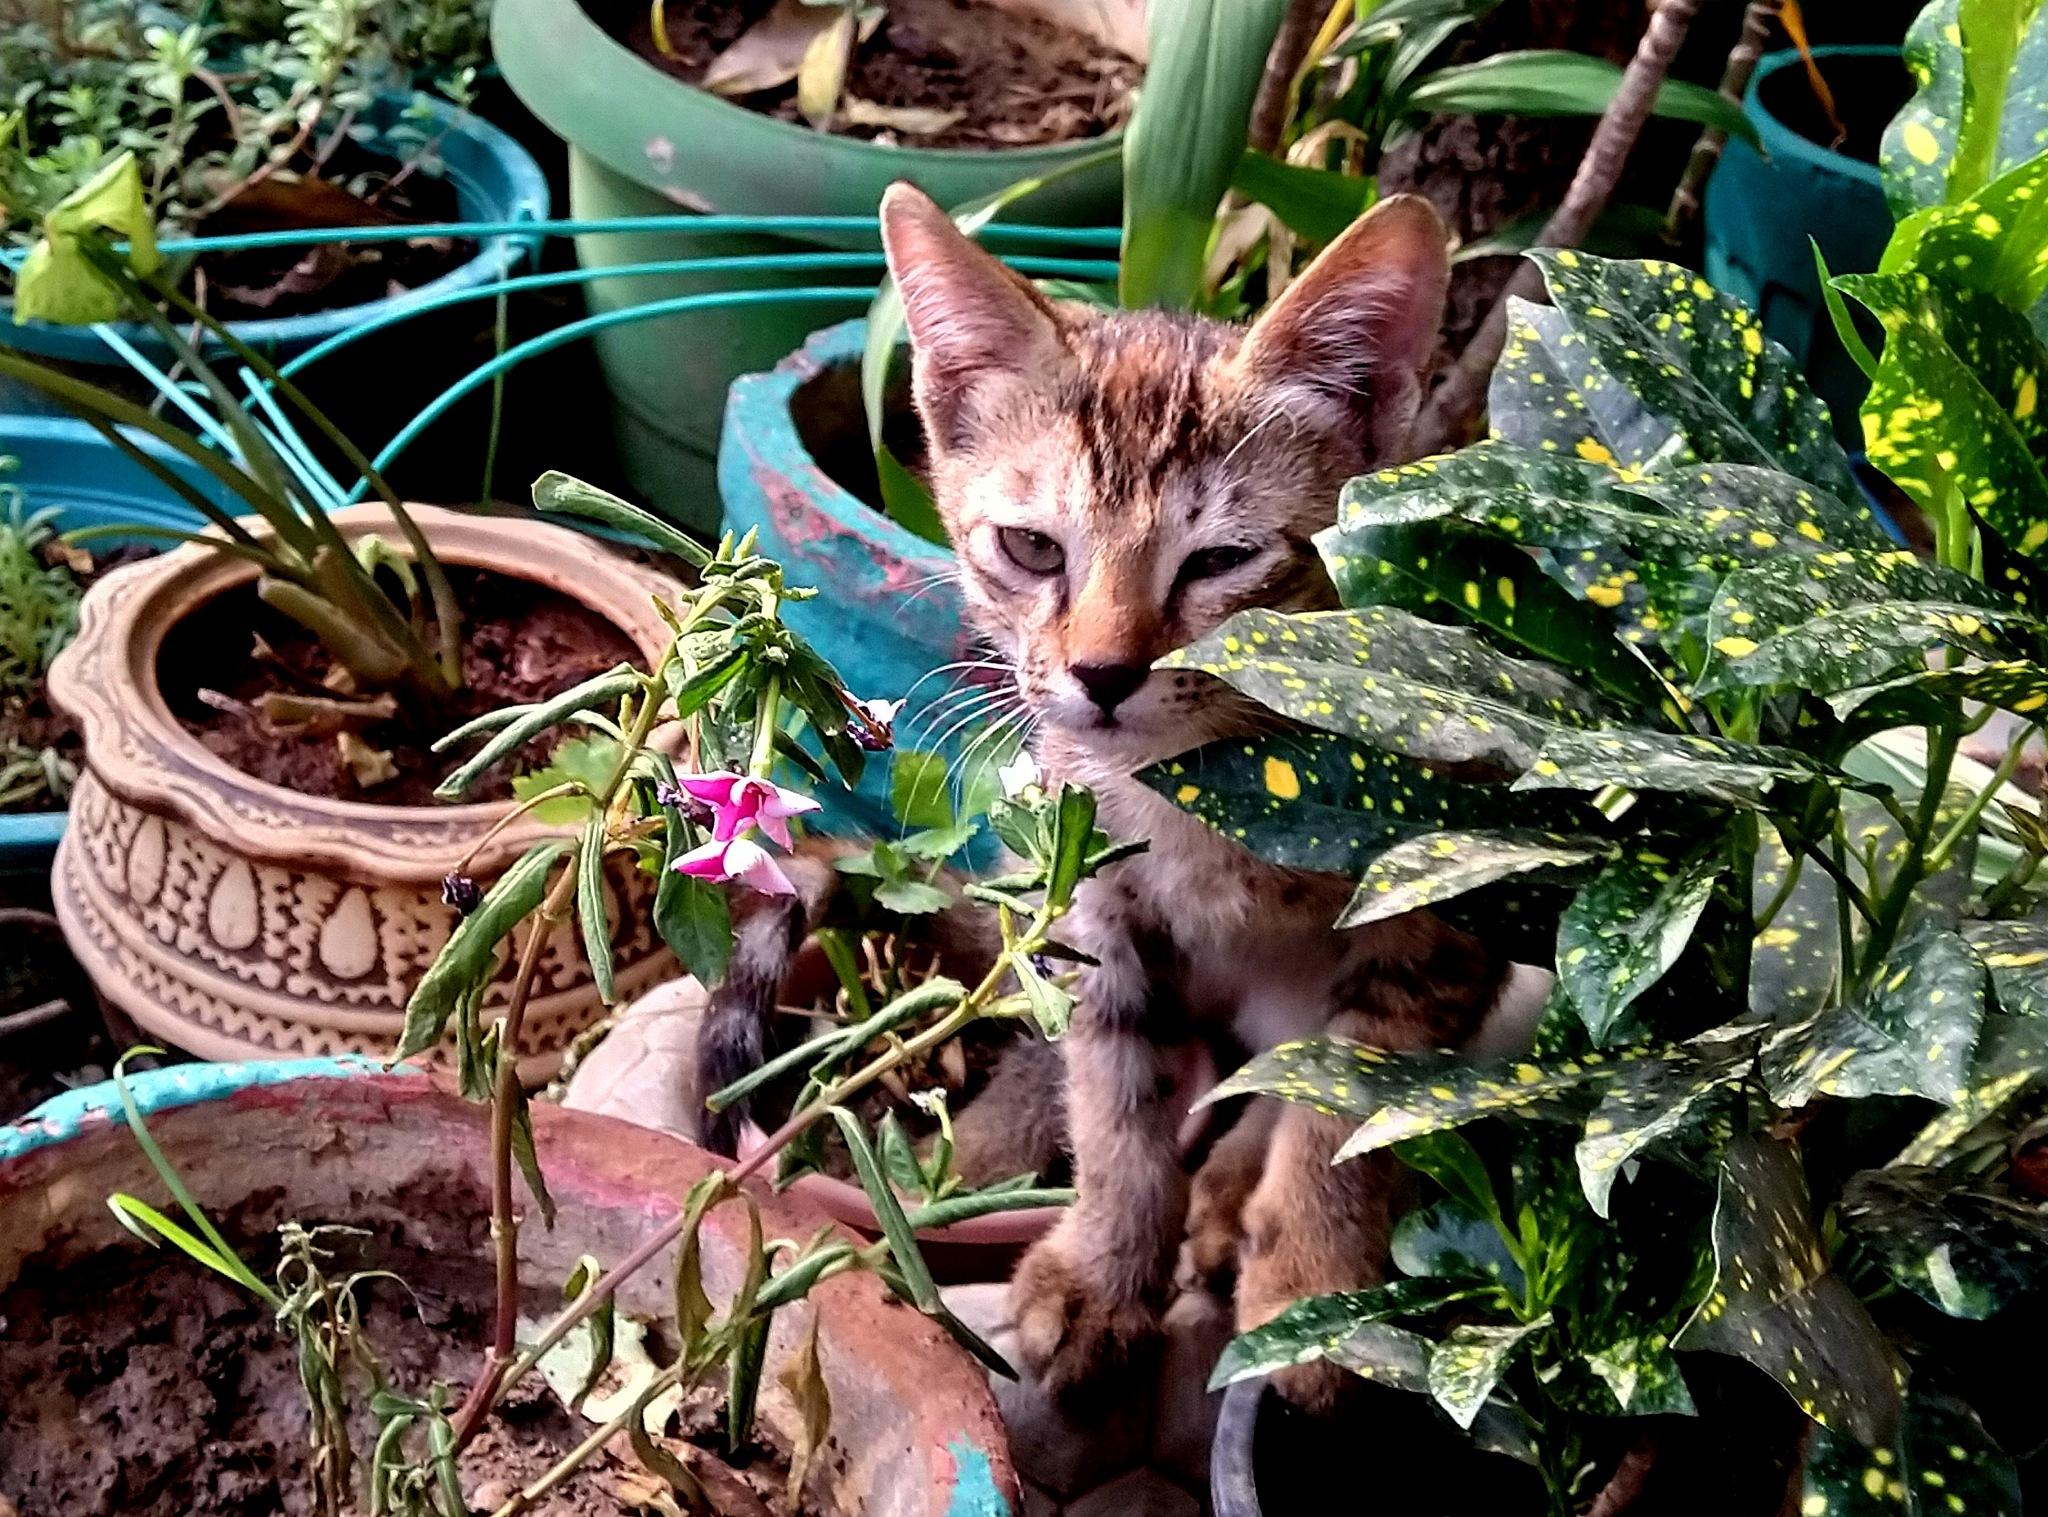 Encounter with Kittens 3 by Suresh Tewari